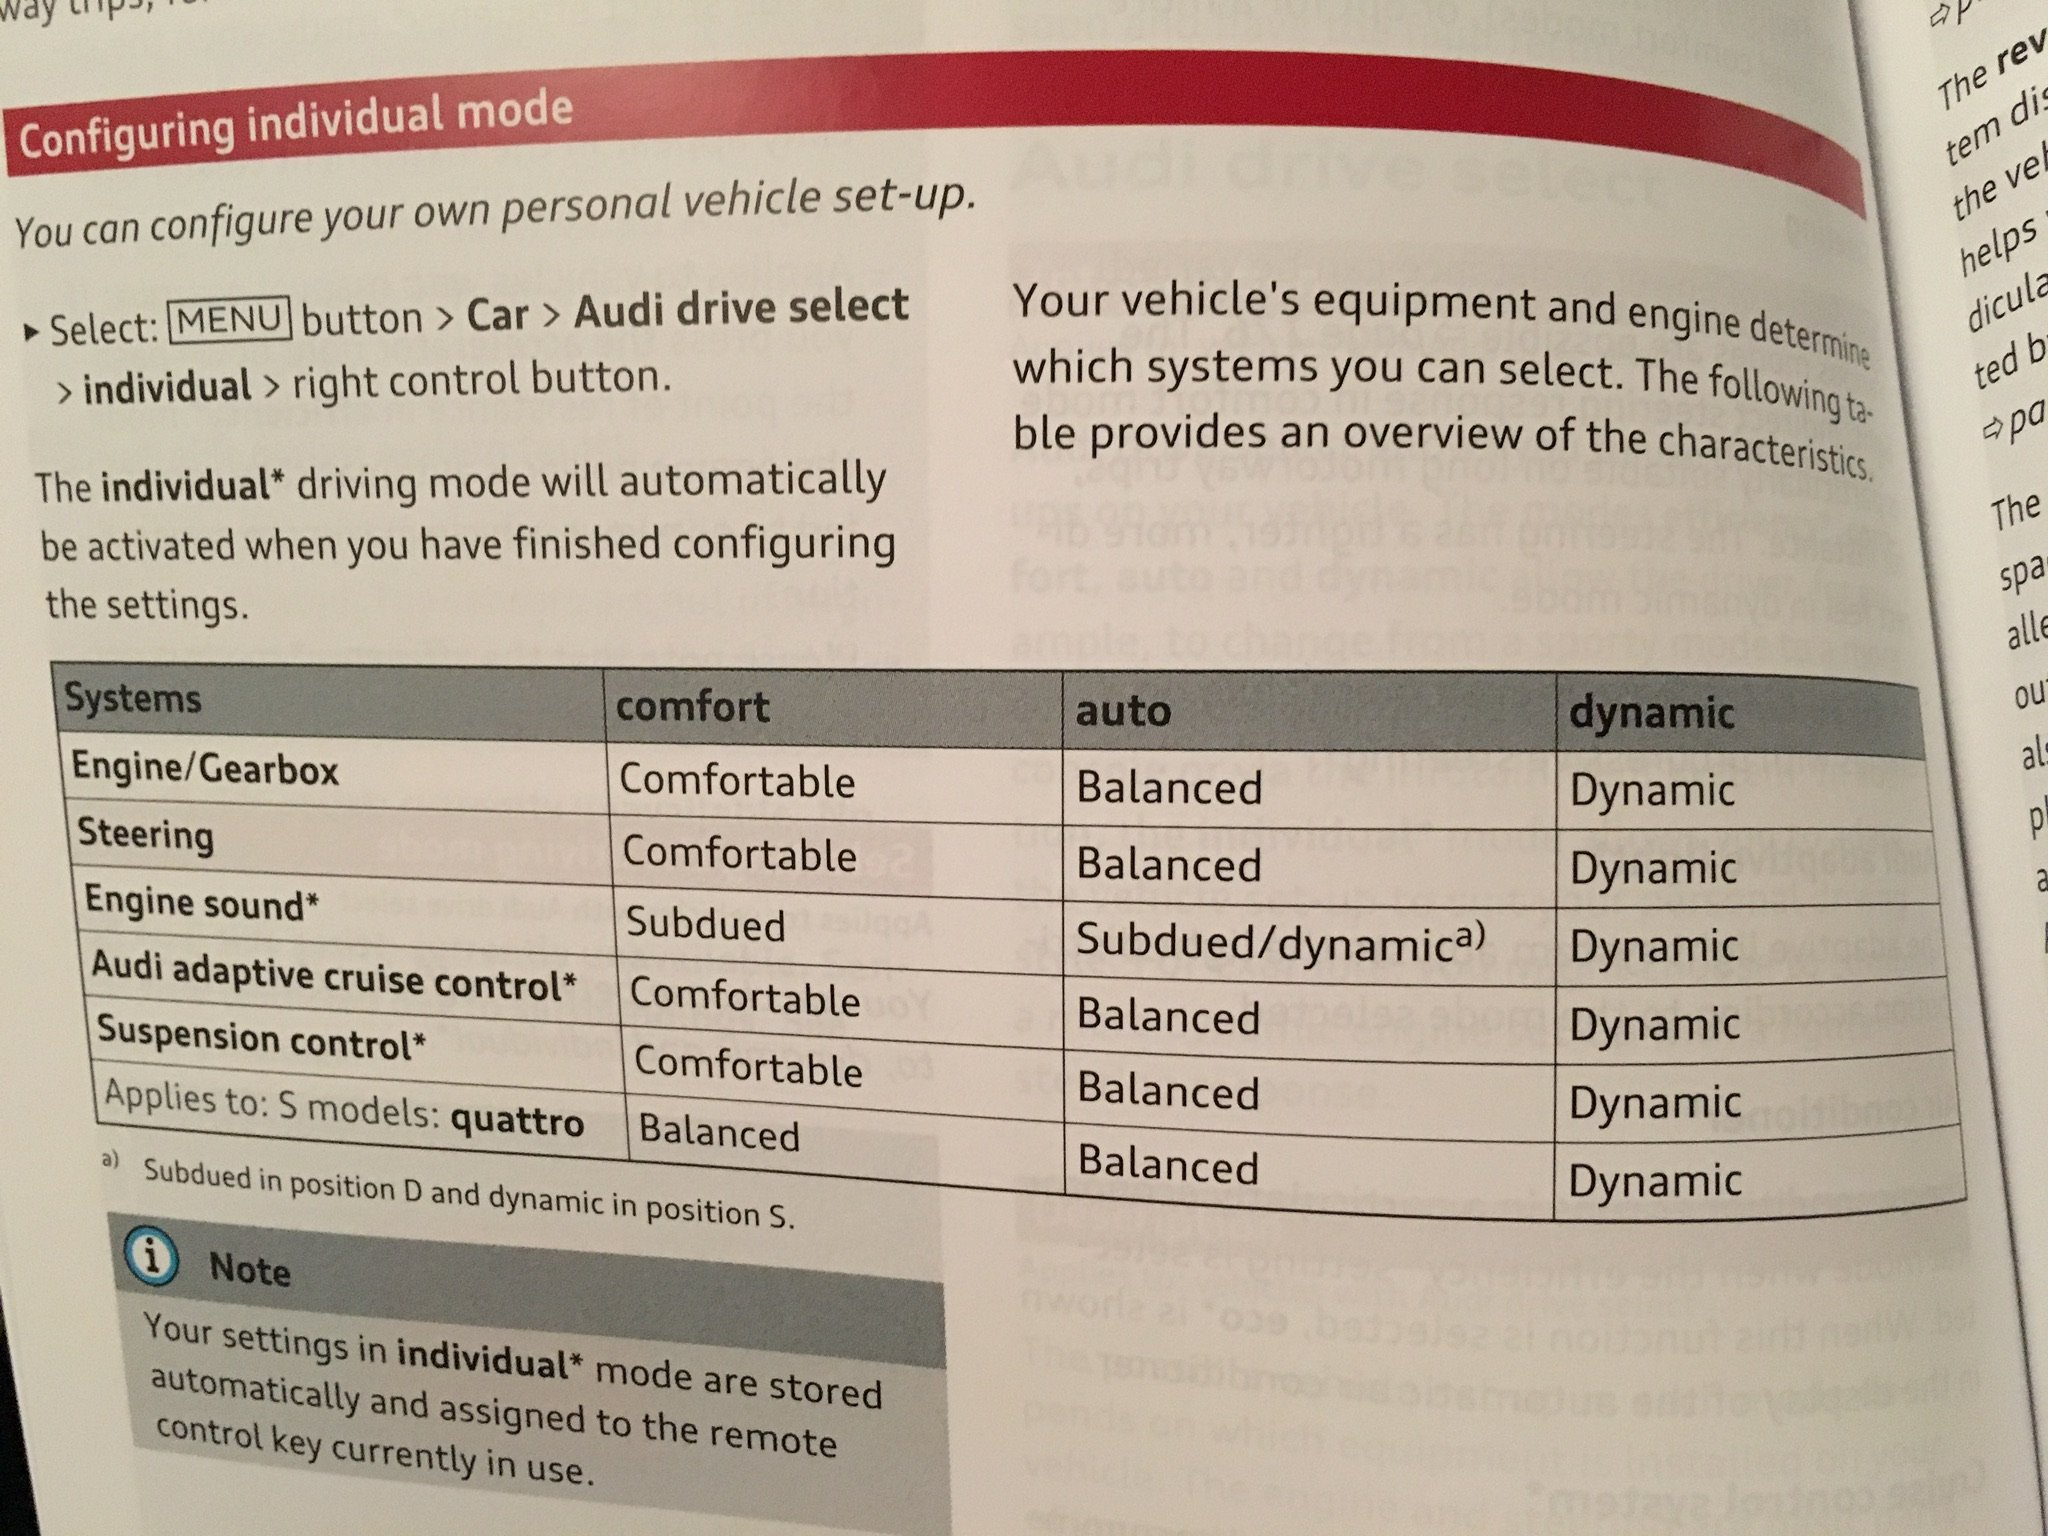 Audi Drive Select Effectiveness